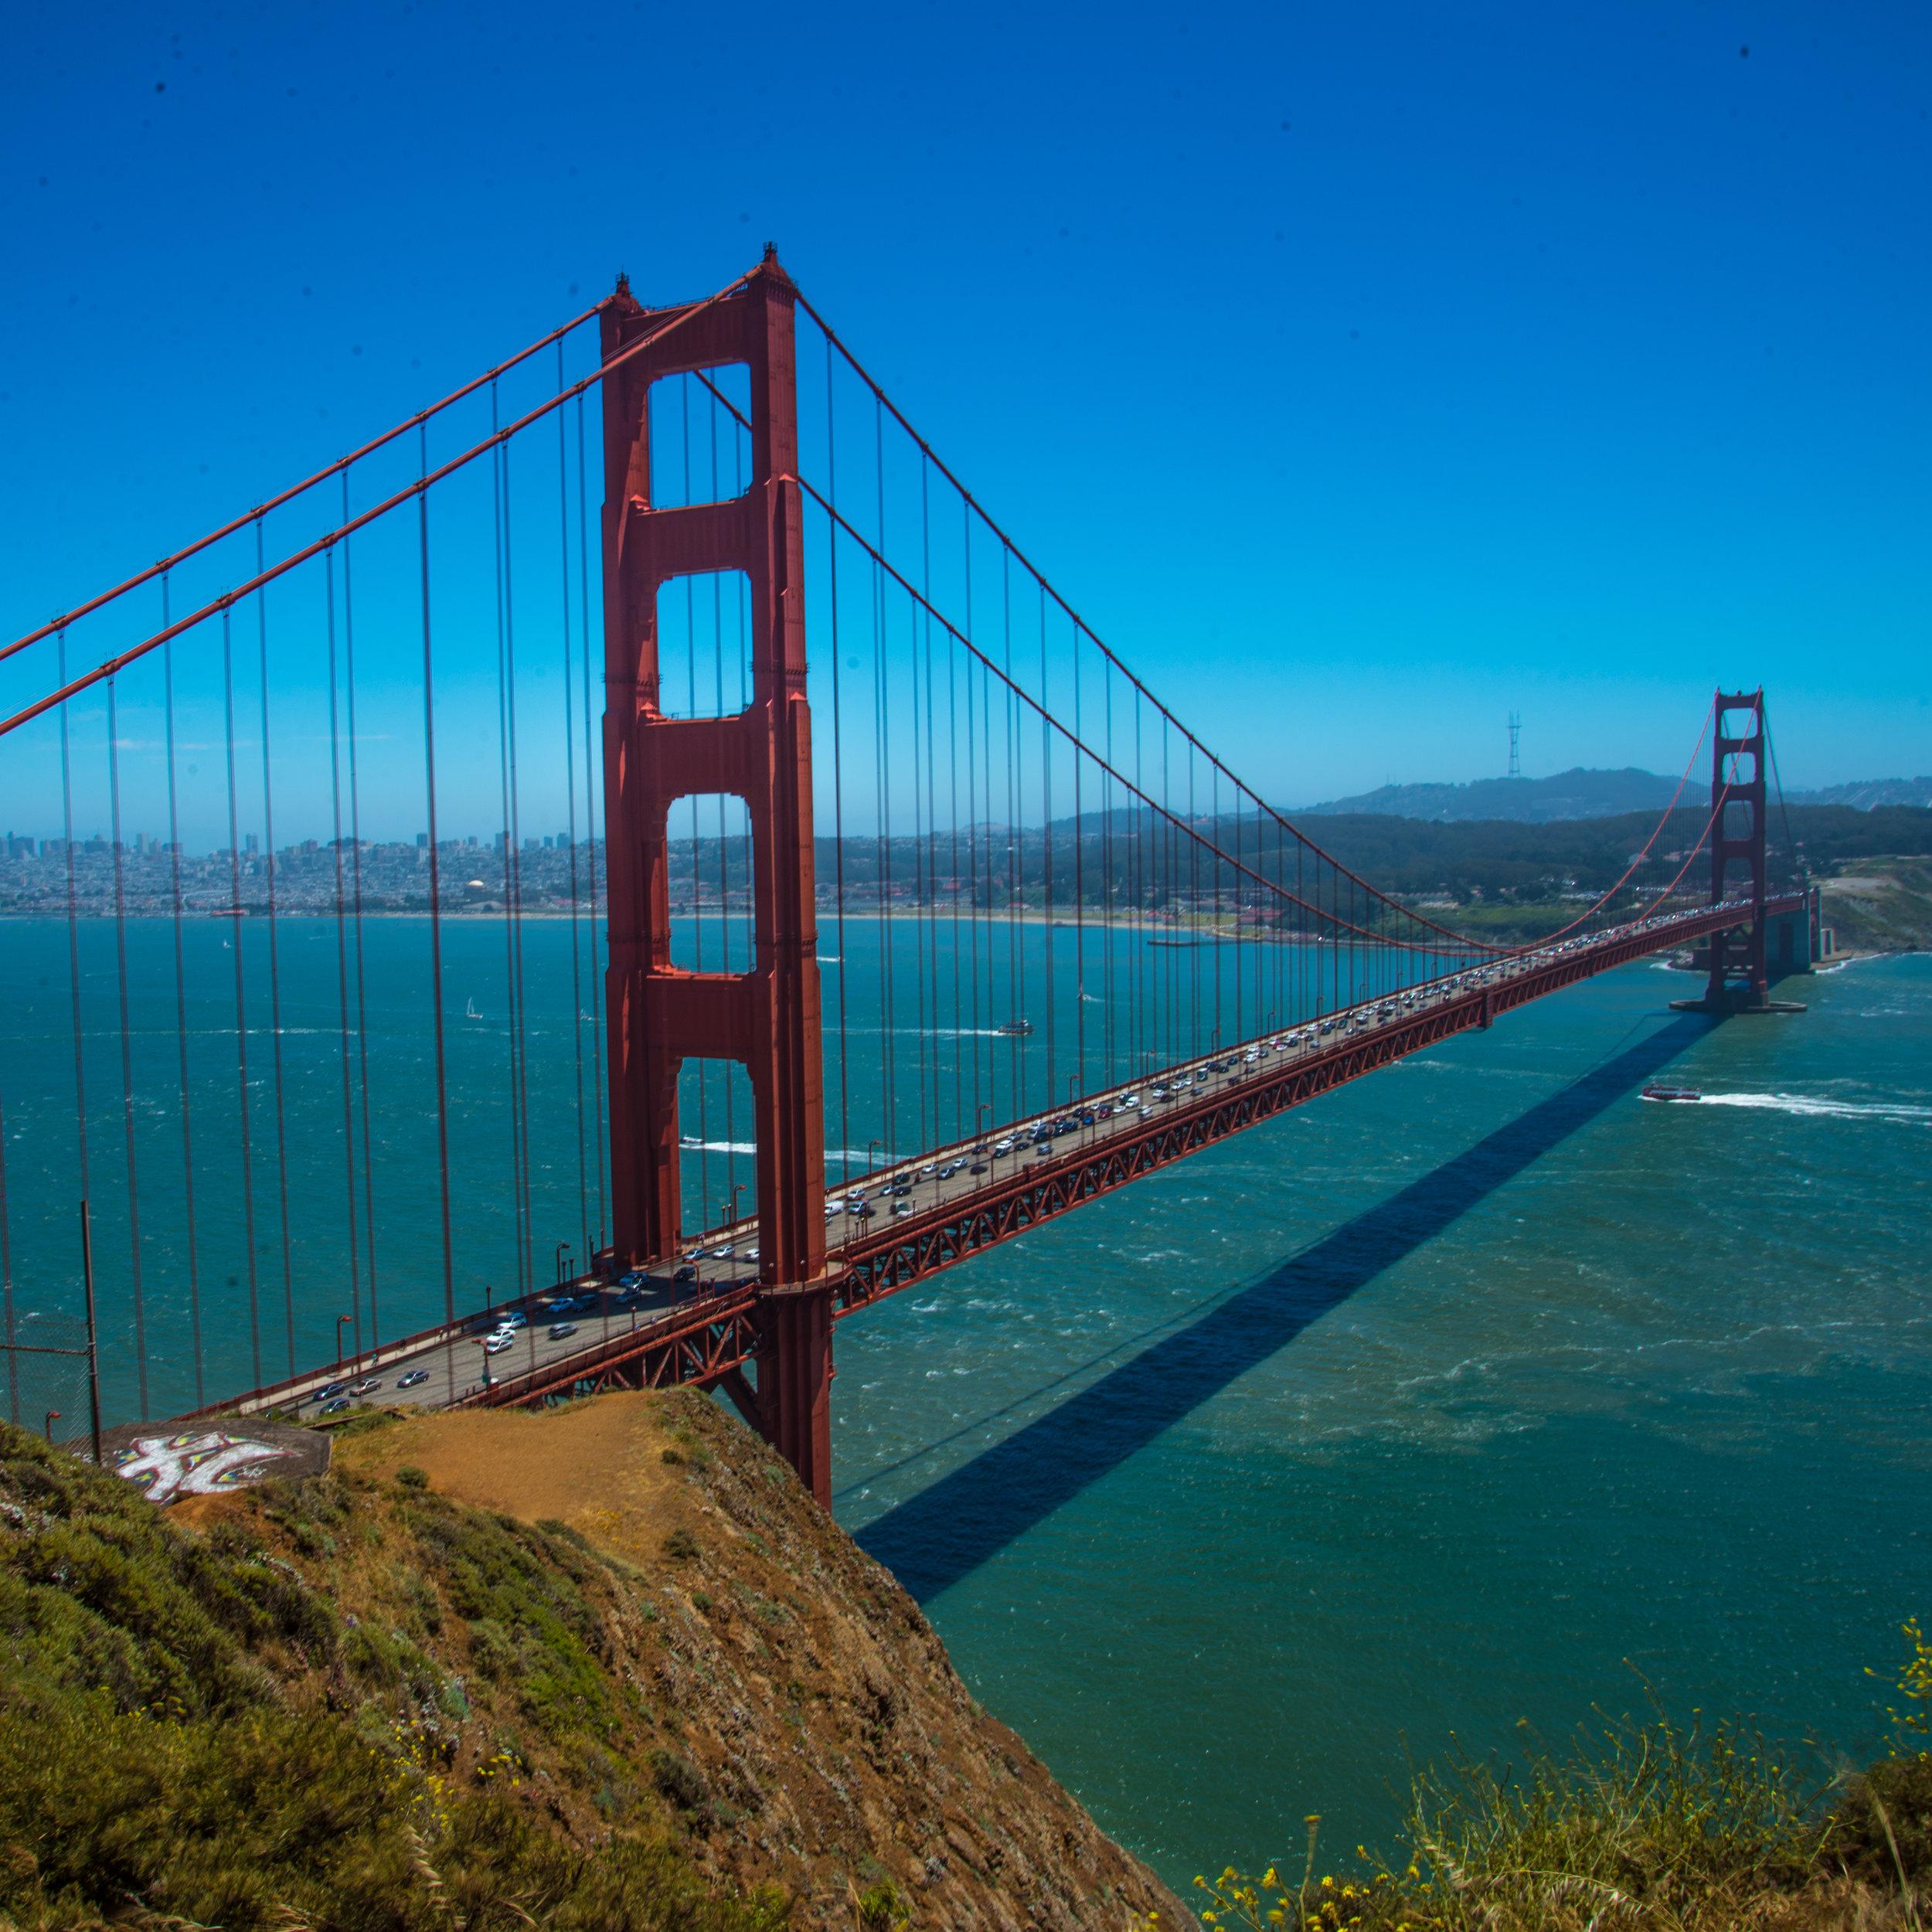 San Francisco - USA 1989 - 1996